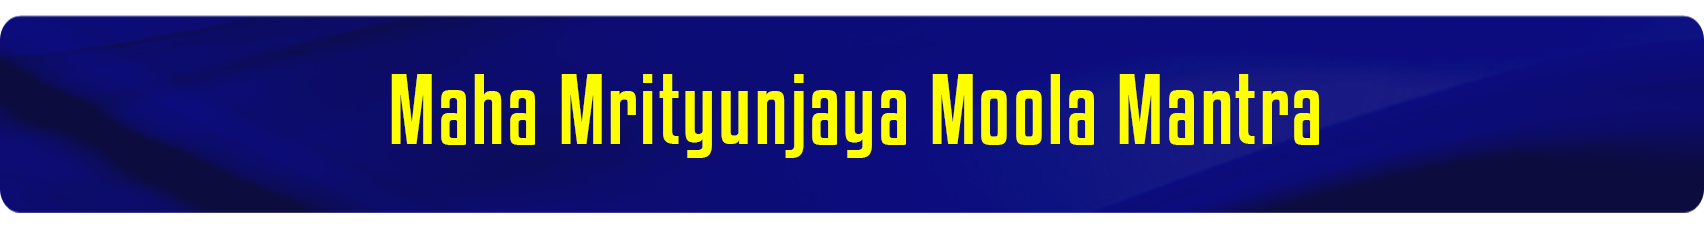 Mrityunjaya Moola Mantra